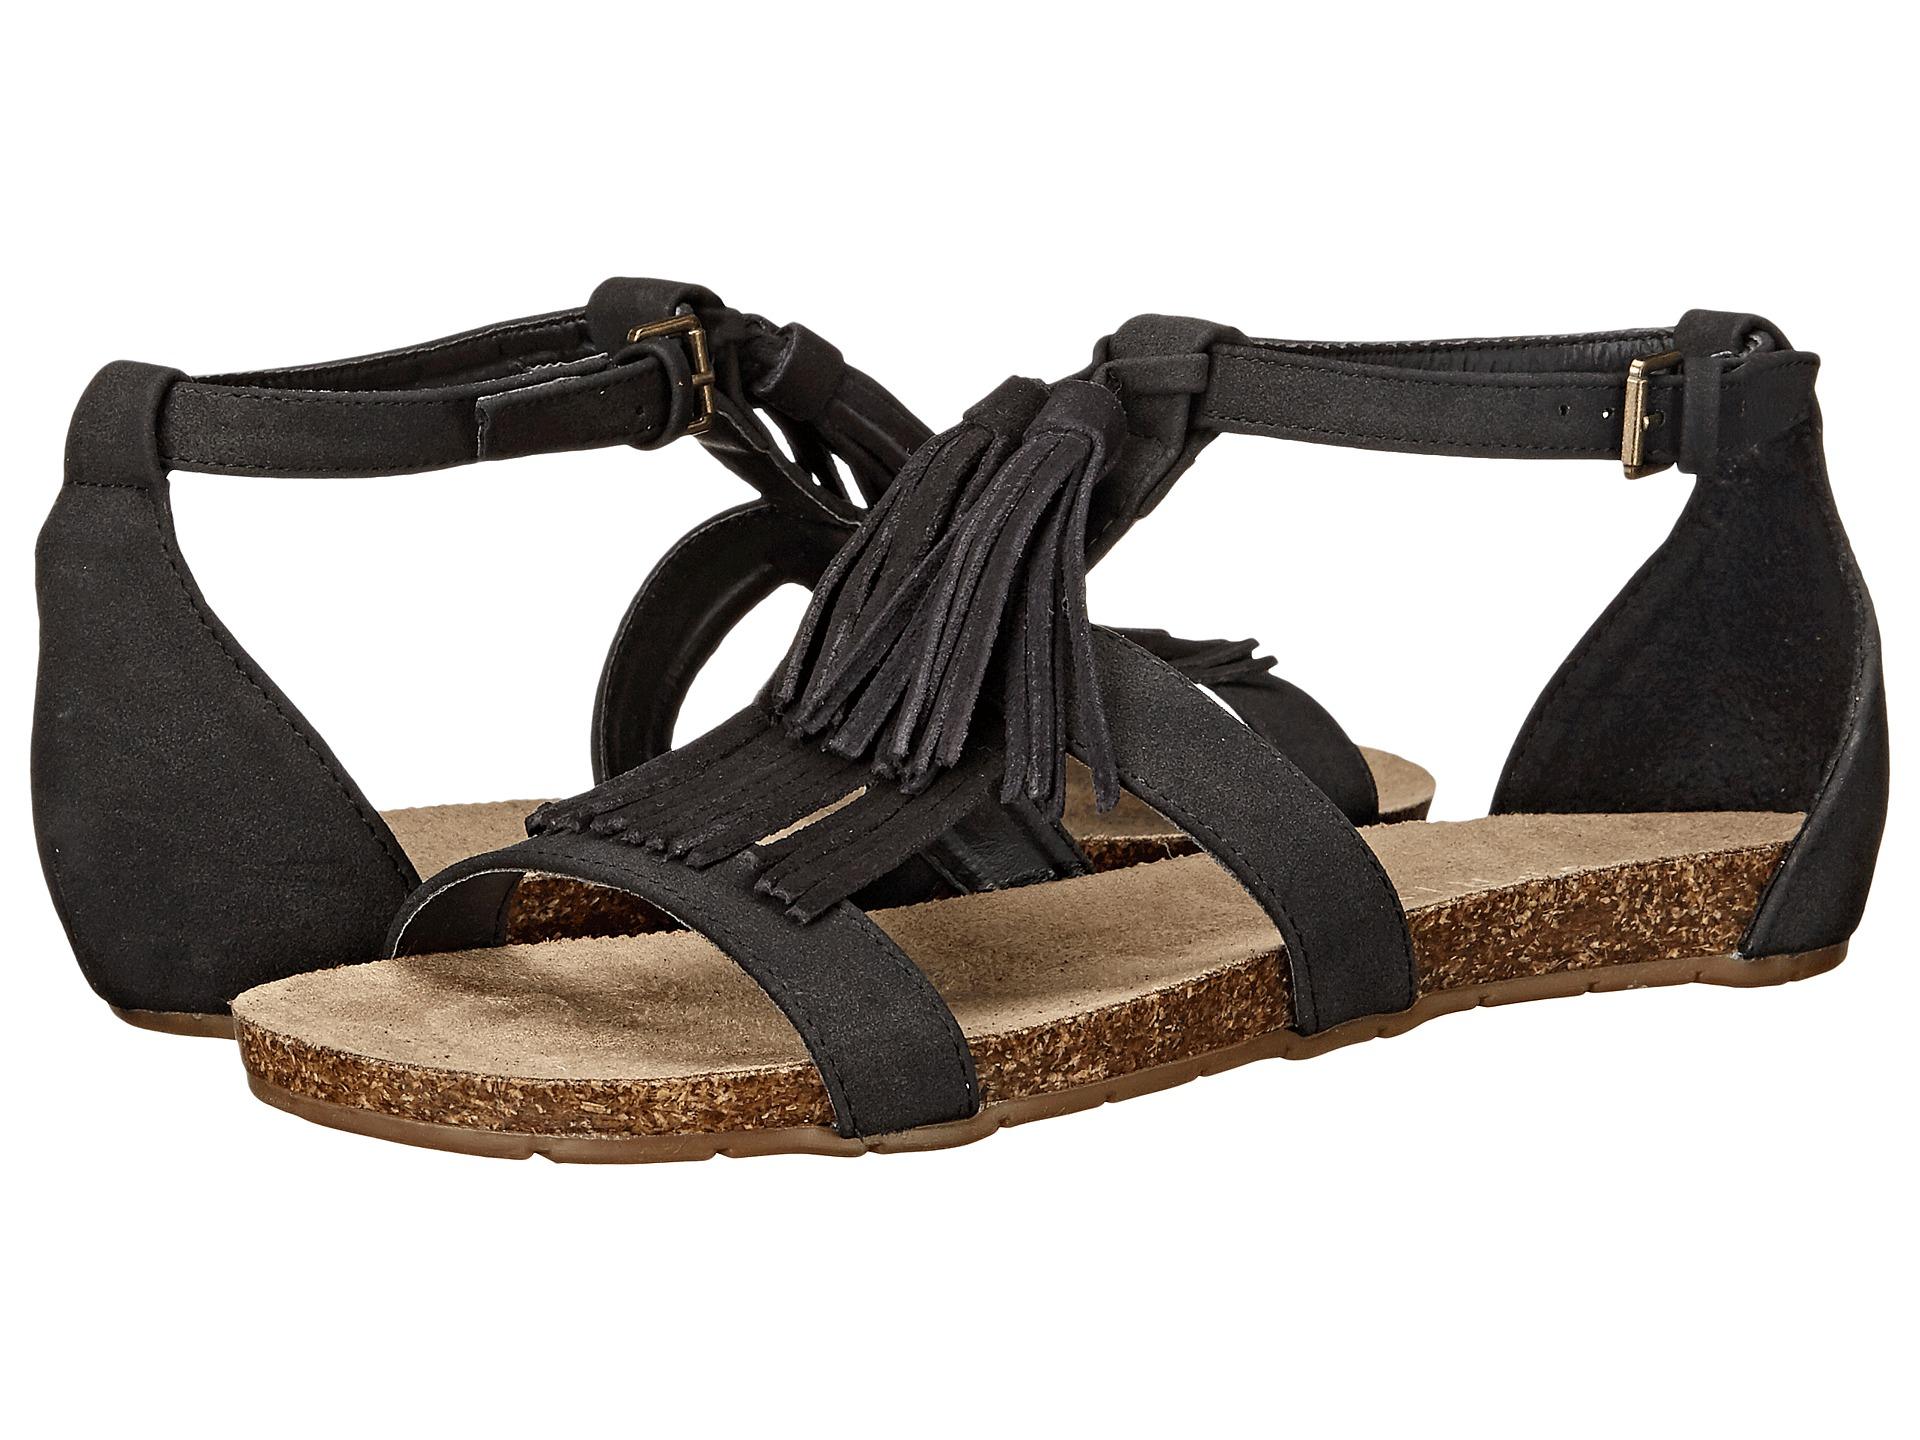 Black esprit sandals - Black Esprit Sandals 46